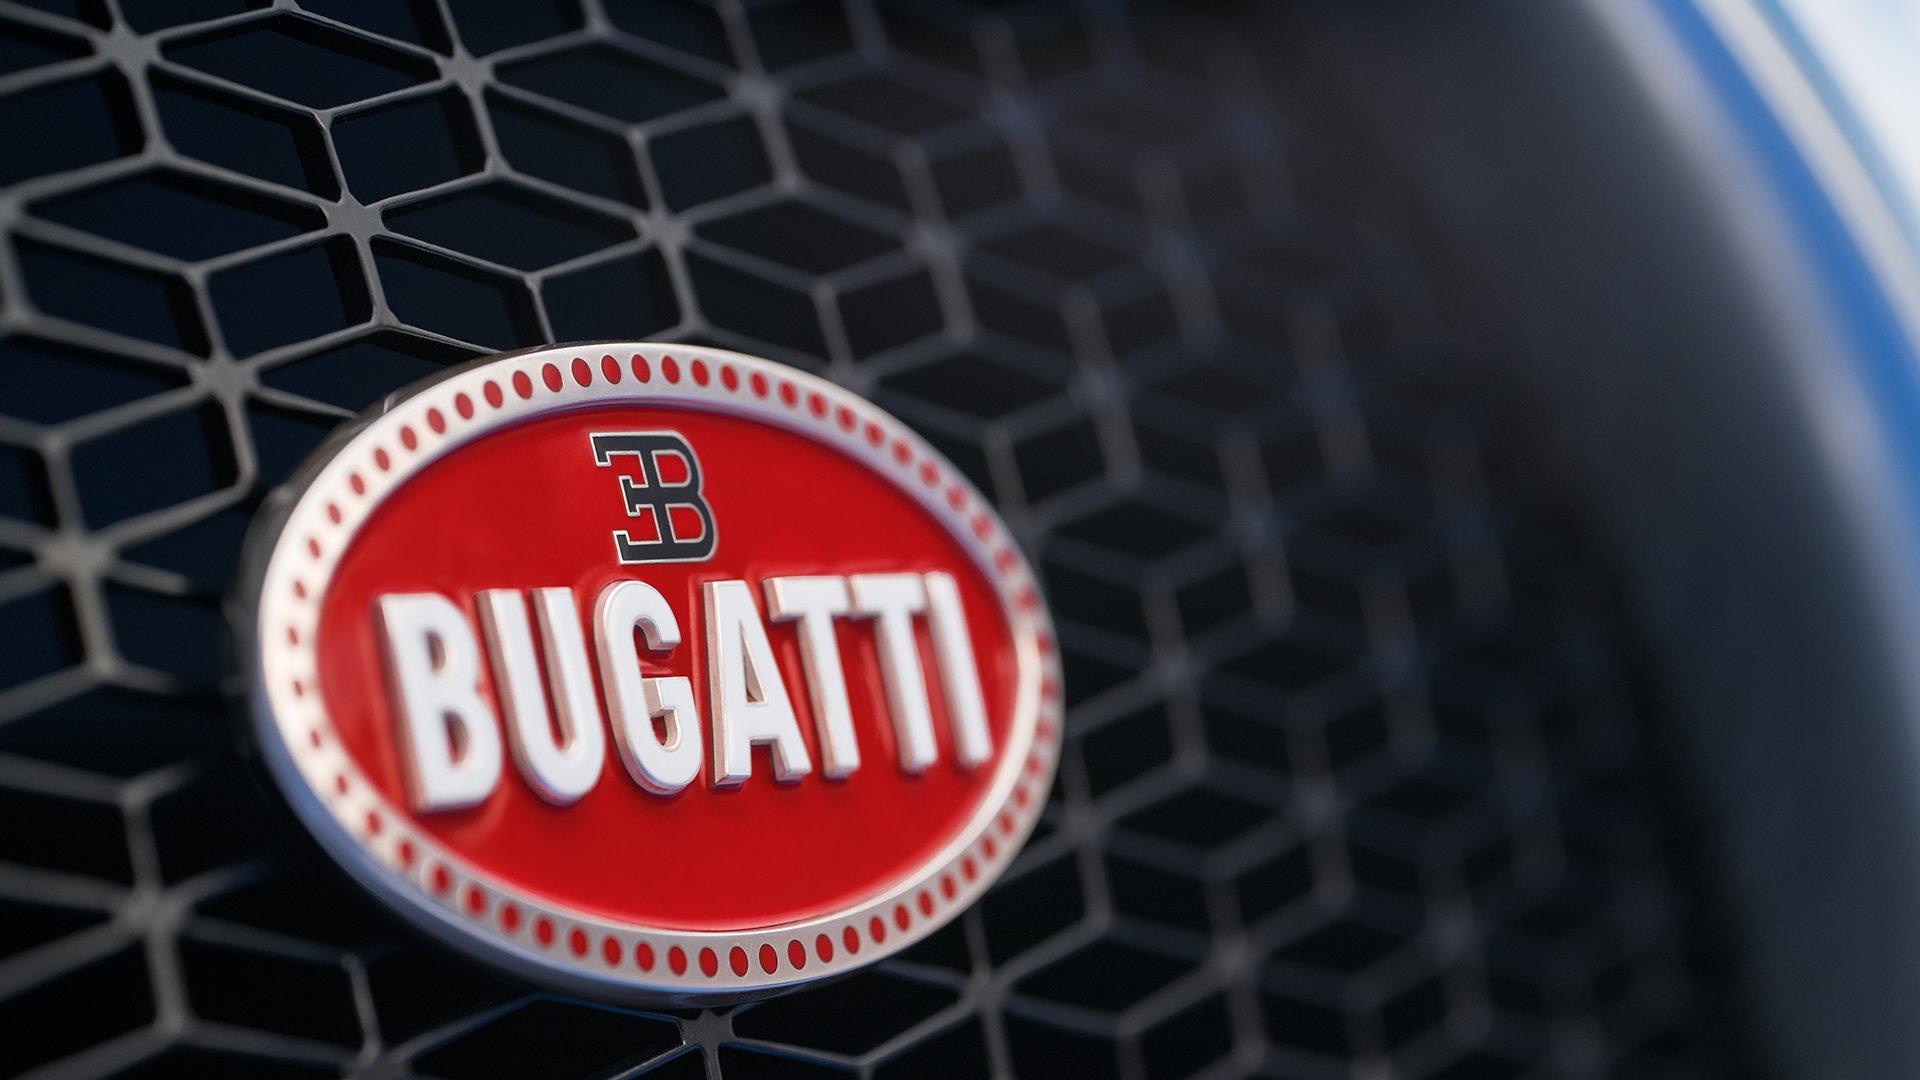 Bugatti Baby II grill